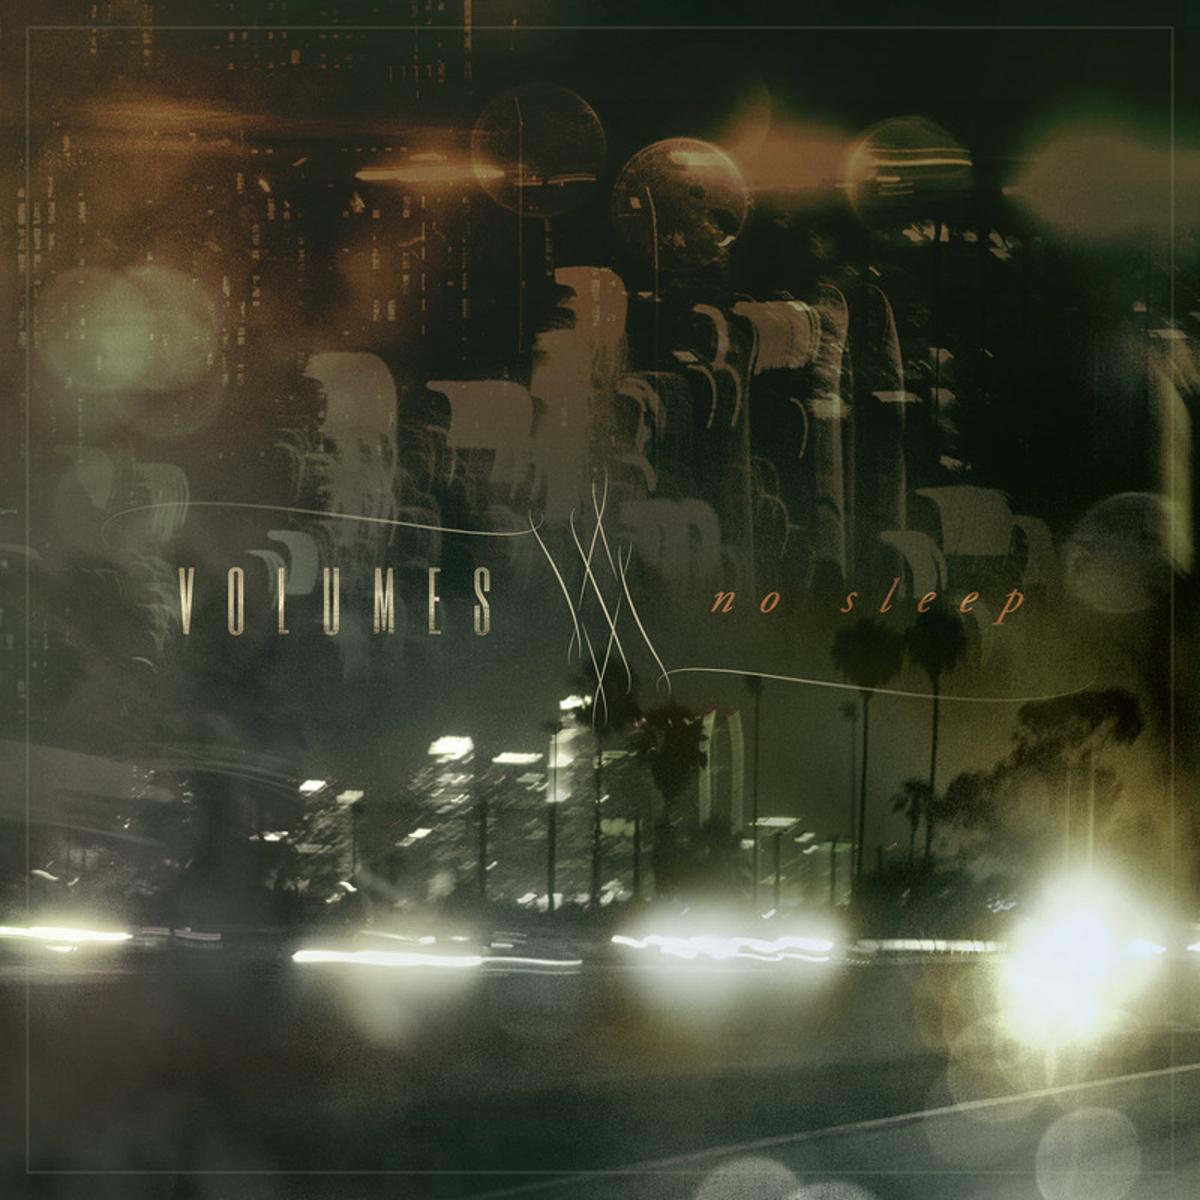 Volumes - No Sleep (2014)